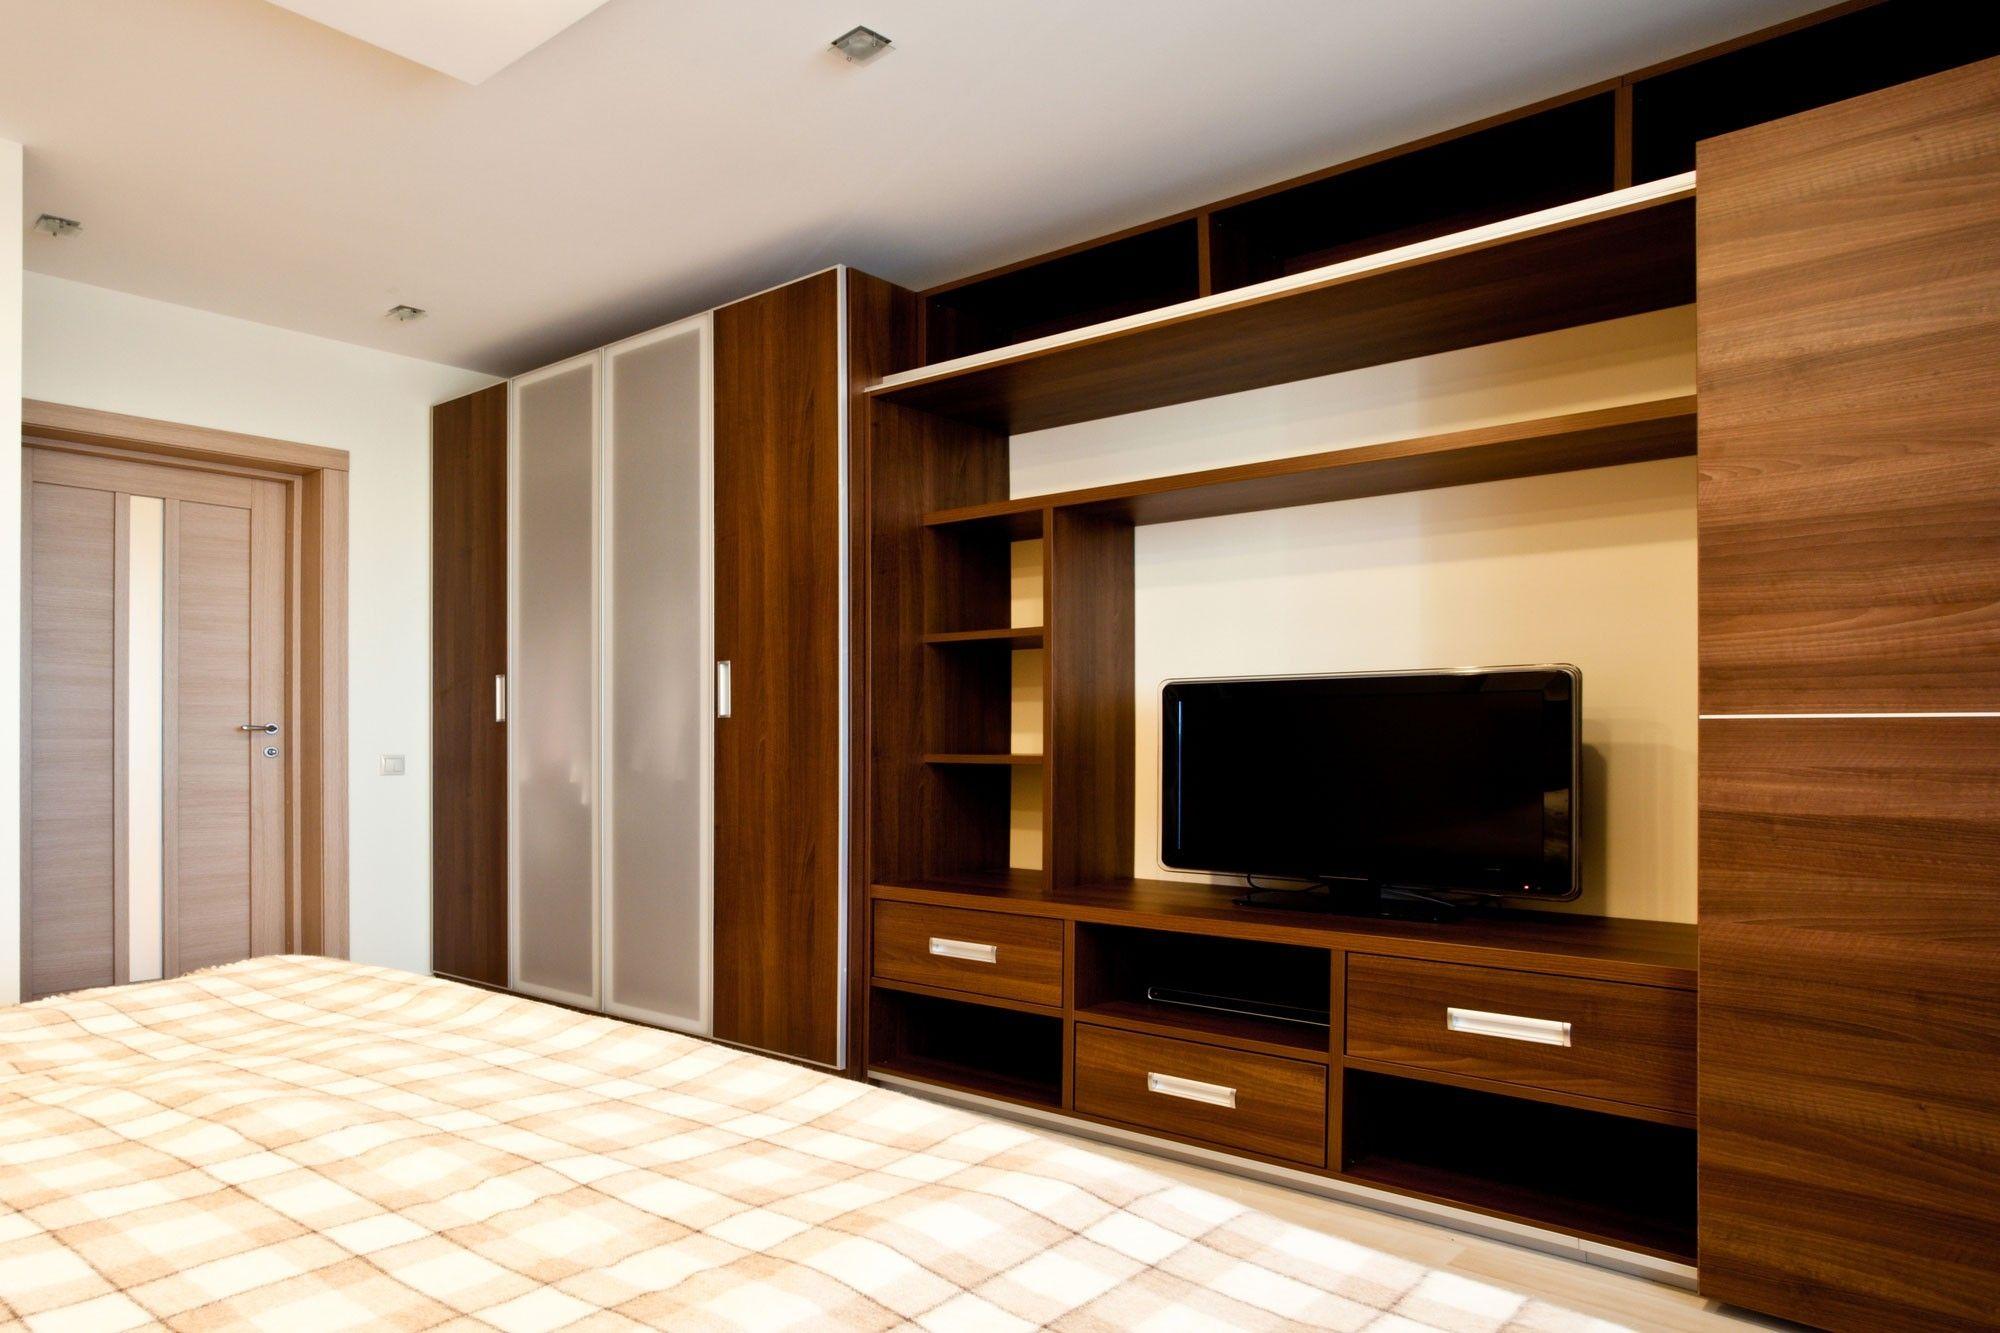 Bedroom Wardrobe Designs With Tv Unit Bedroom Plaid Bedding And With Bedroom Wardrobe Designs Wi Bedroom Tv Unit Design Bedroom Wardrobe Design Tv Unit Bedroom